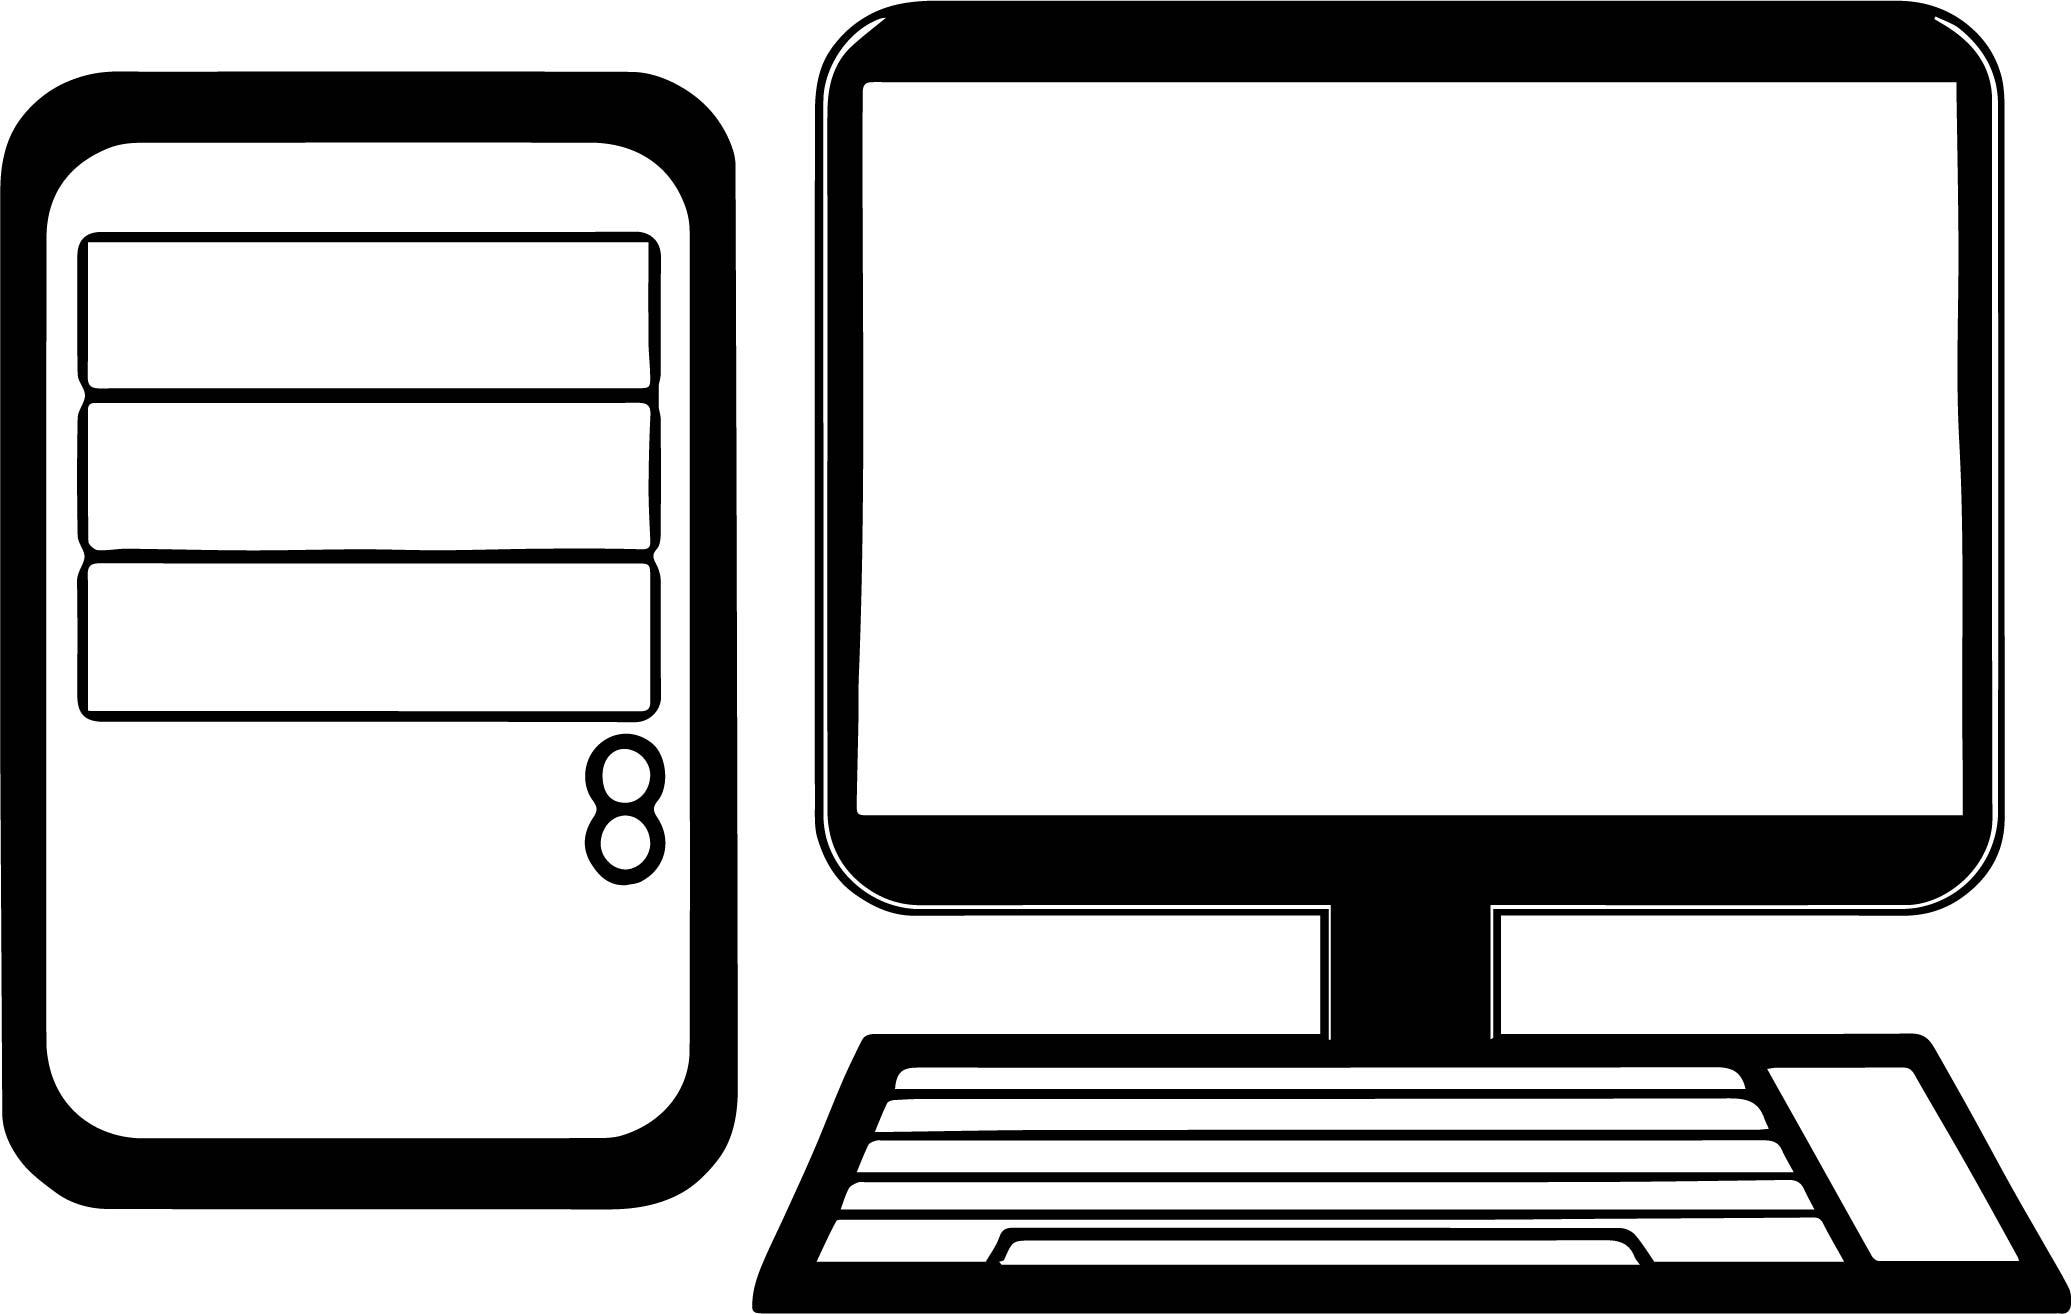 Computers coloring pages ~ Desktop Computer Coloring Page | Wecoloringpage.com